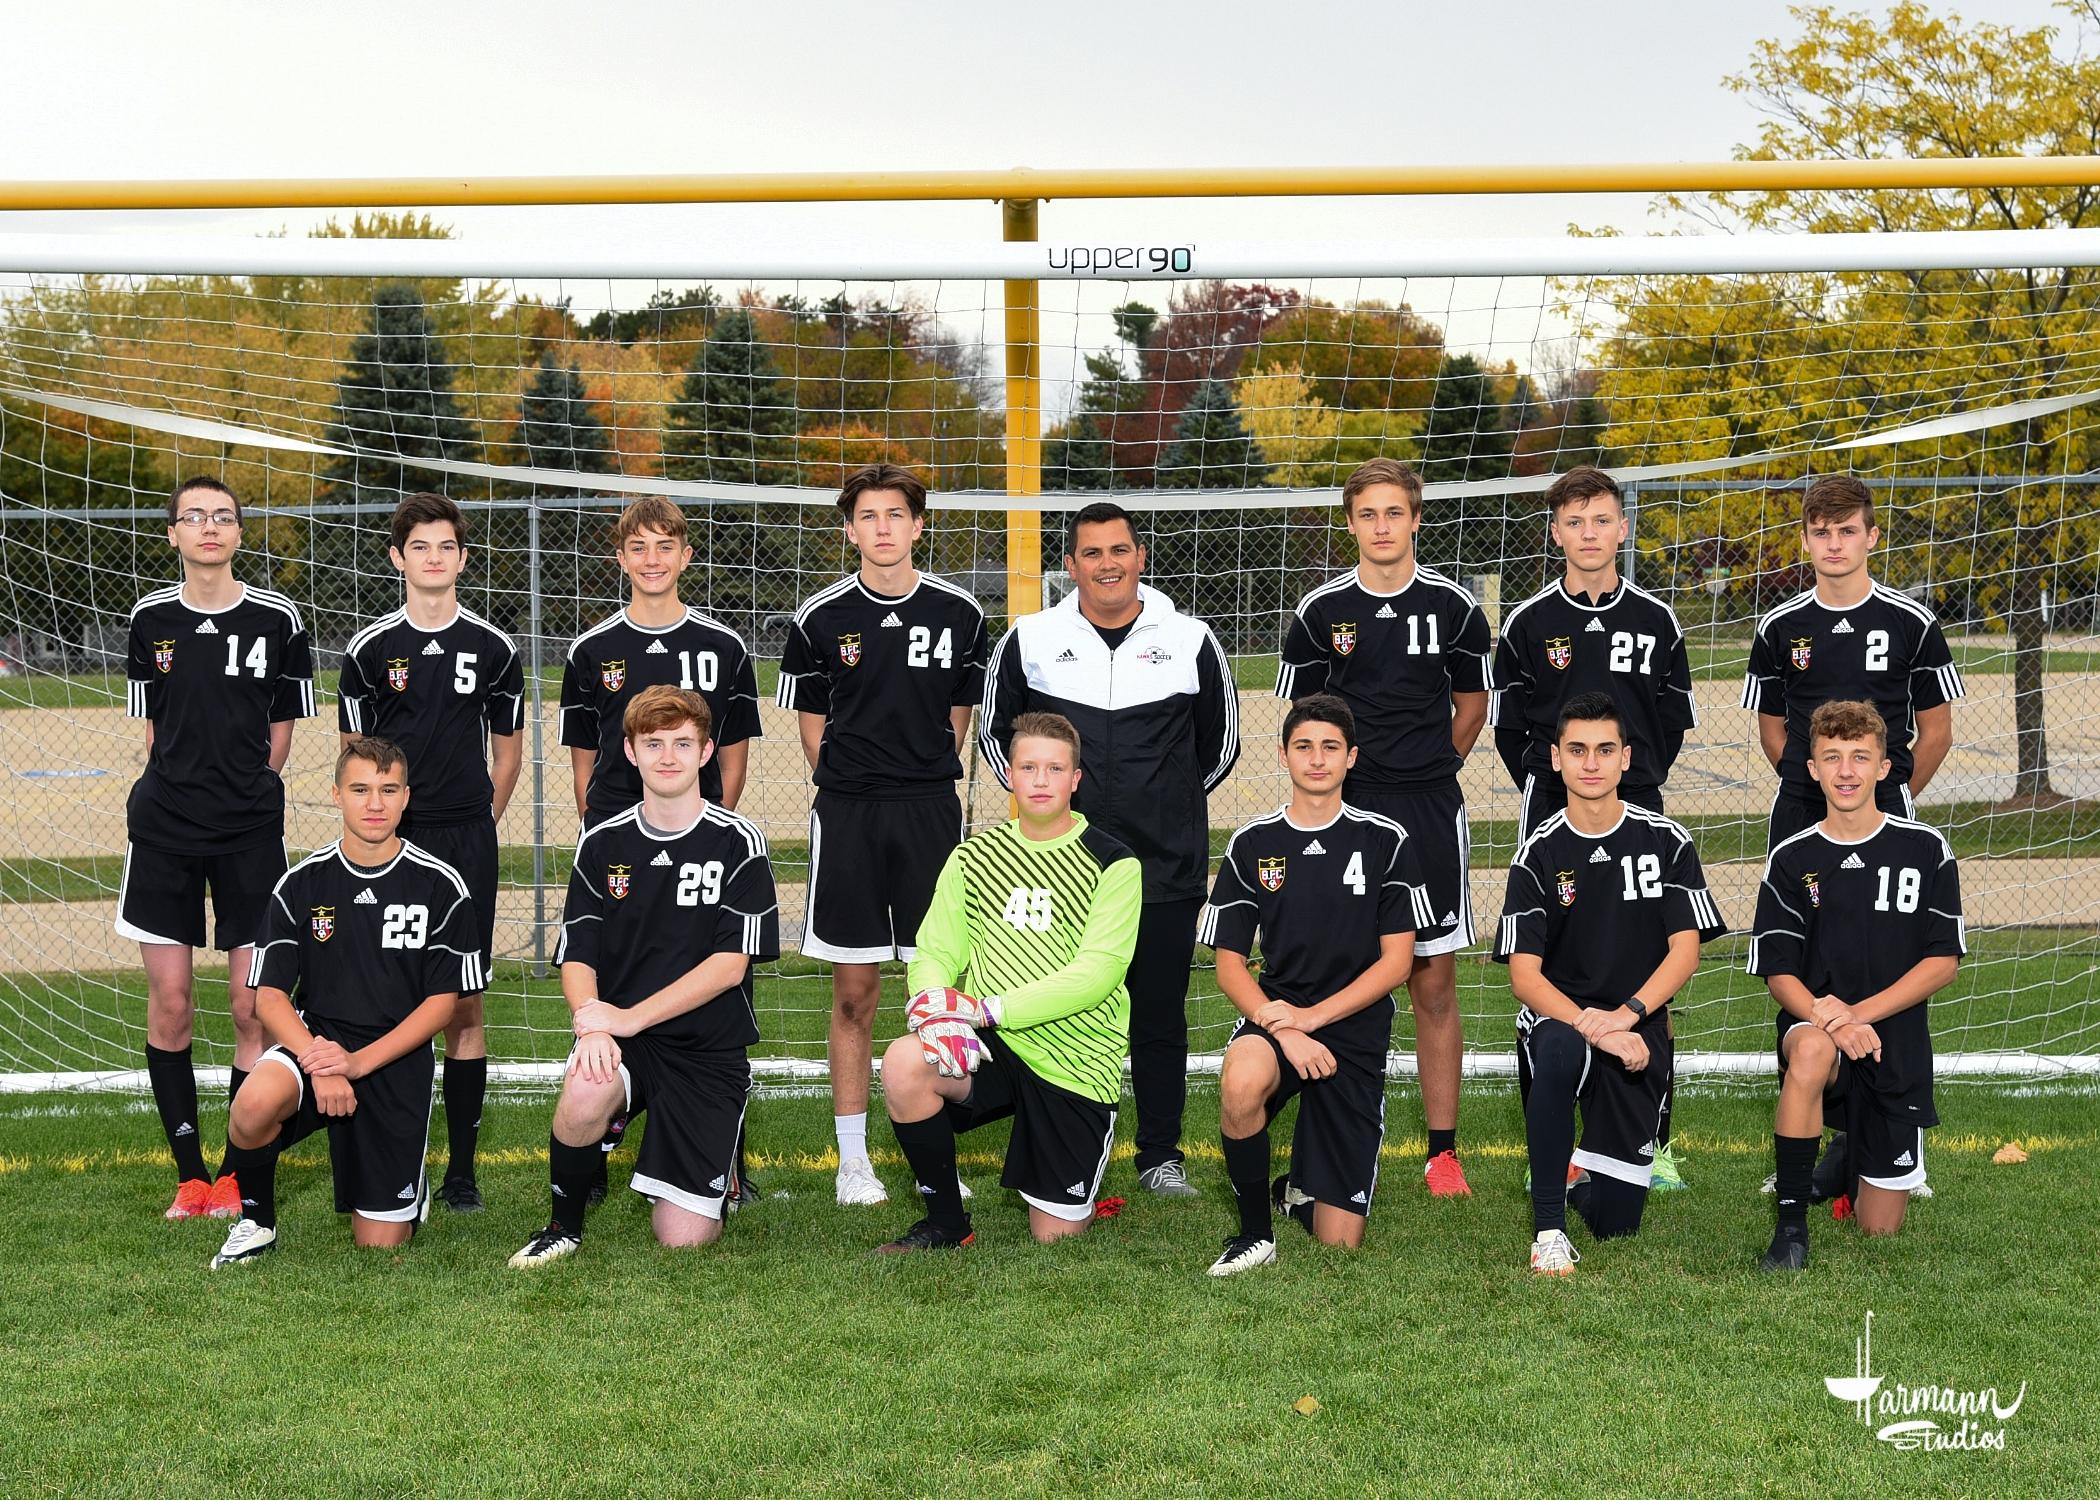 2020 JV1 Boys' Soccer Team